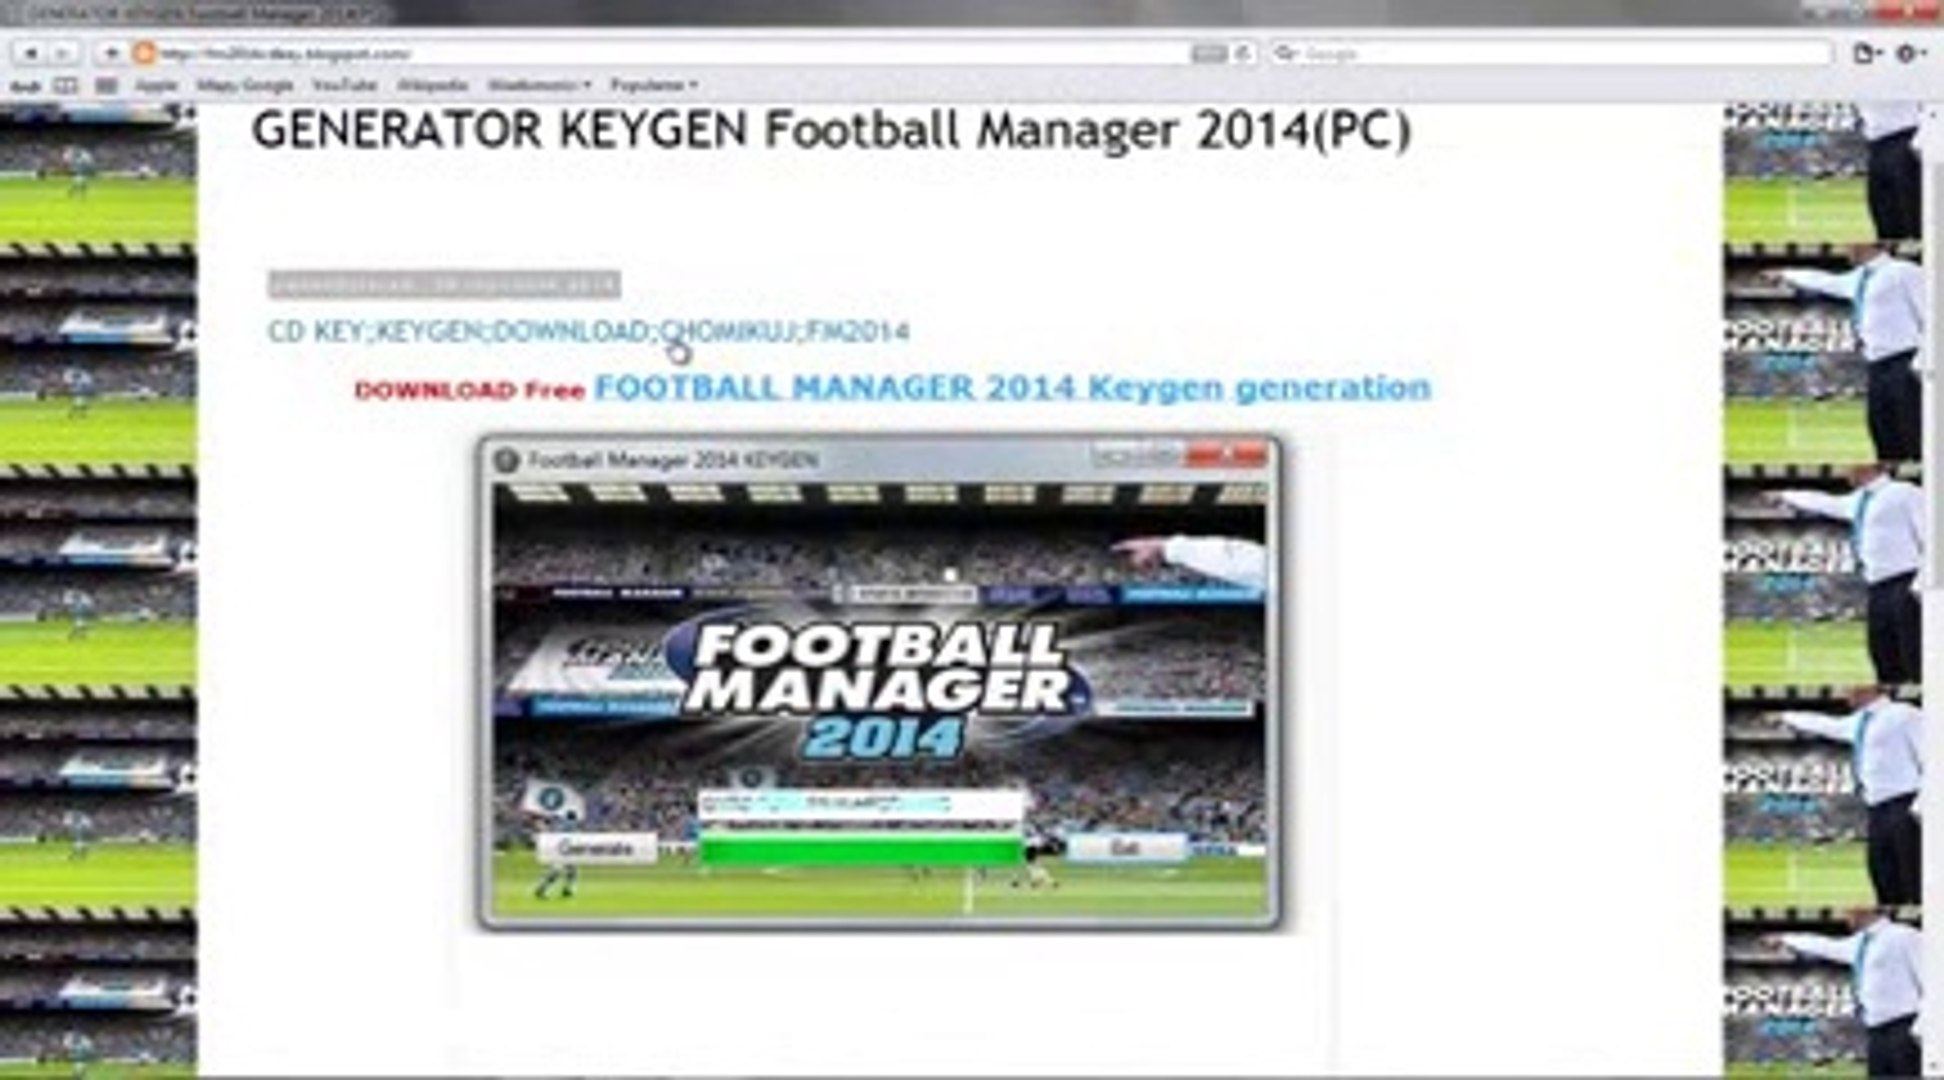 Football Manager 2014 Keygen Download Free Pc Cd Key